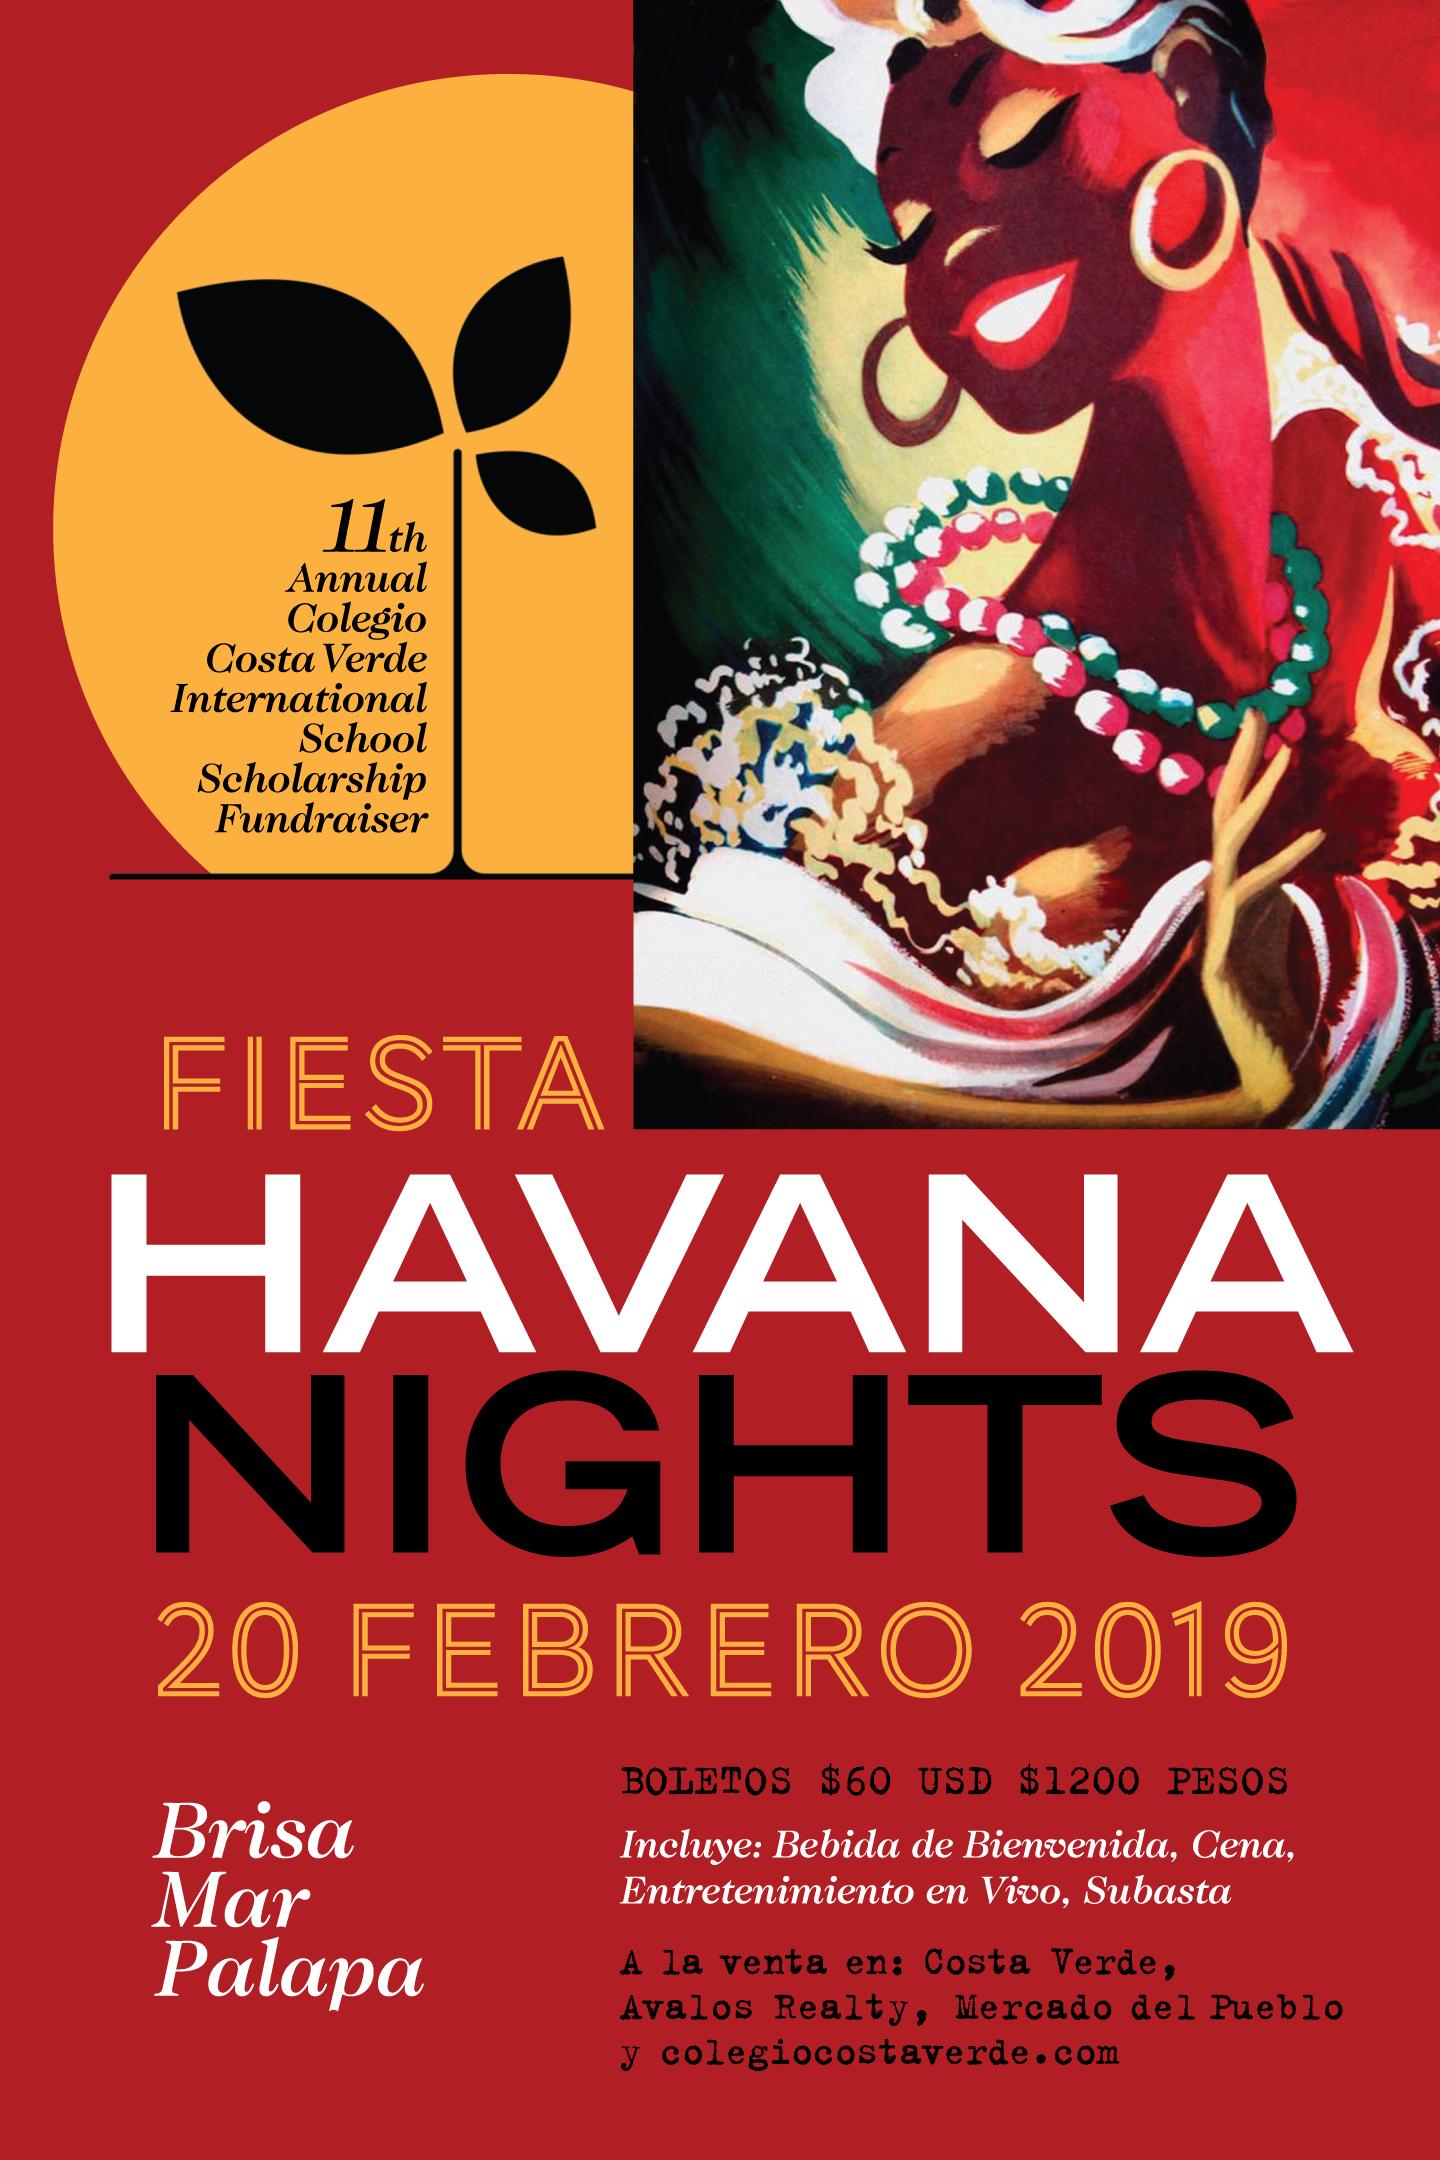 Havana_Nights_Invitation_final.jpg